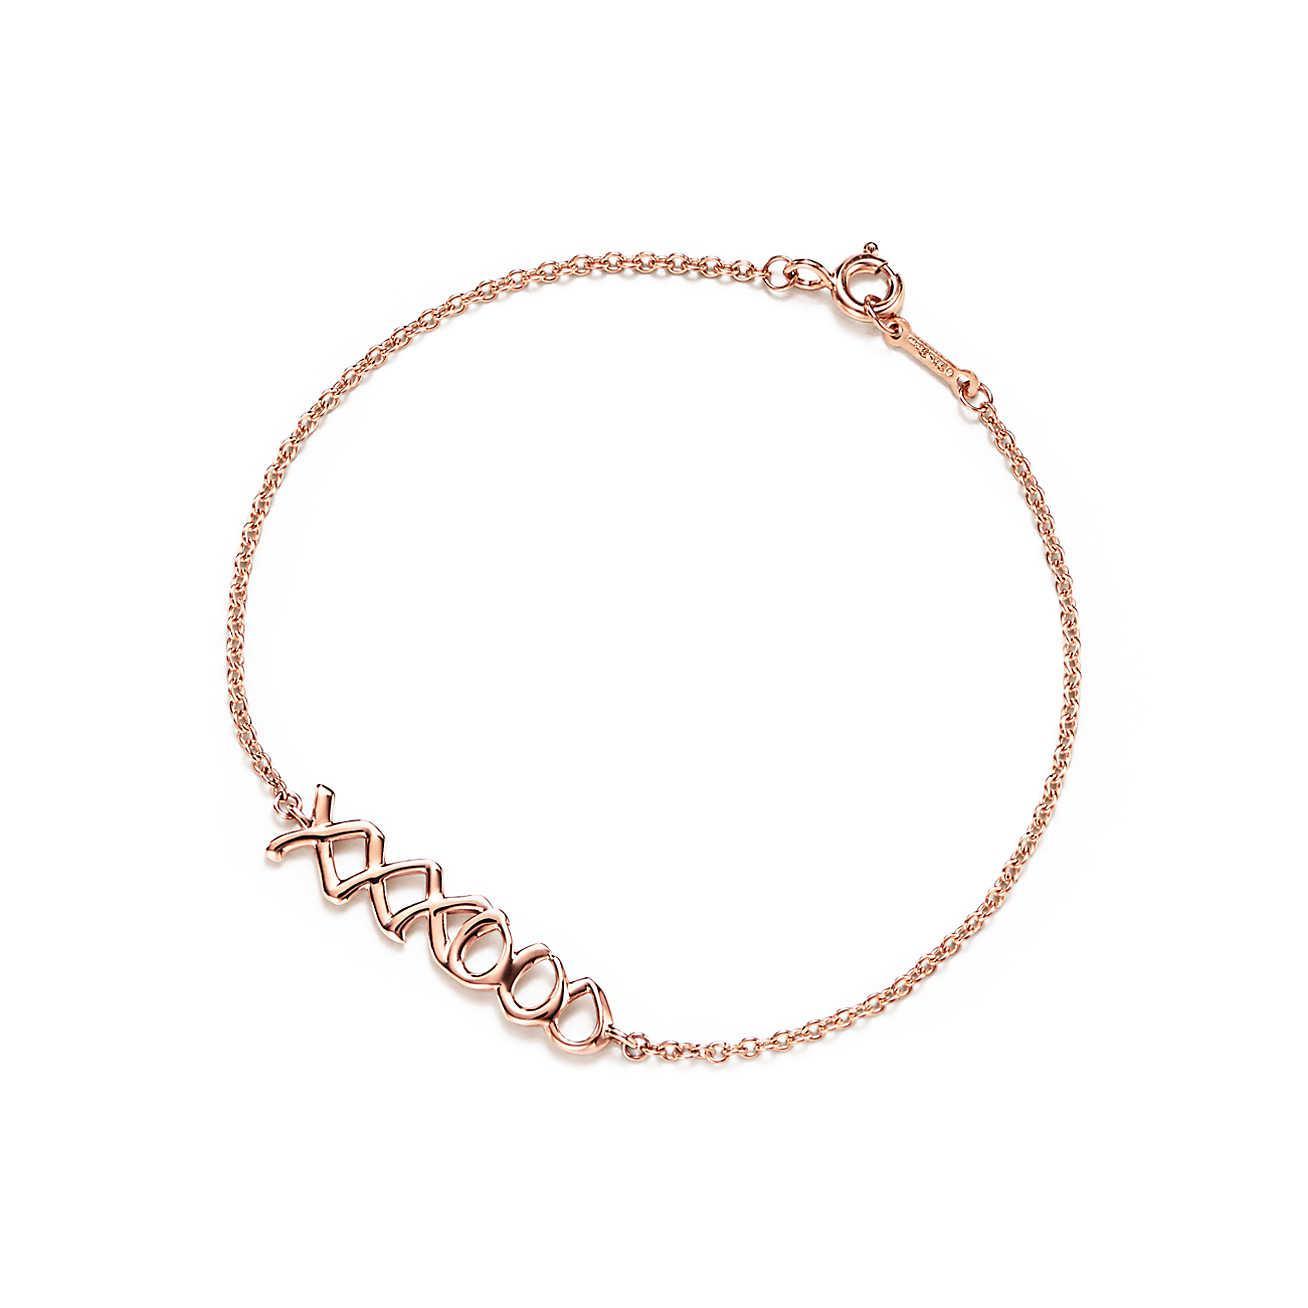 Palomas Graffiti kiss bracelet in 18ct rose gold, size medium Tiffany & Co.